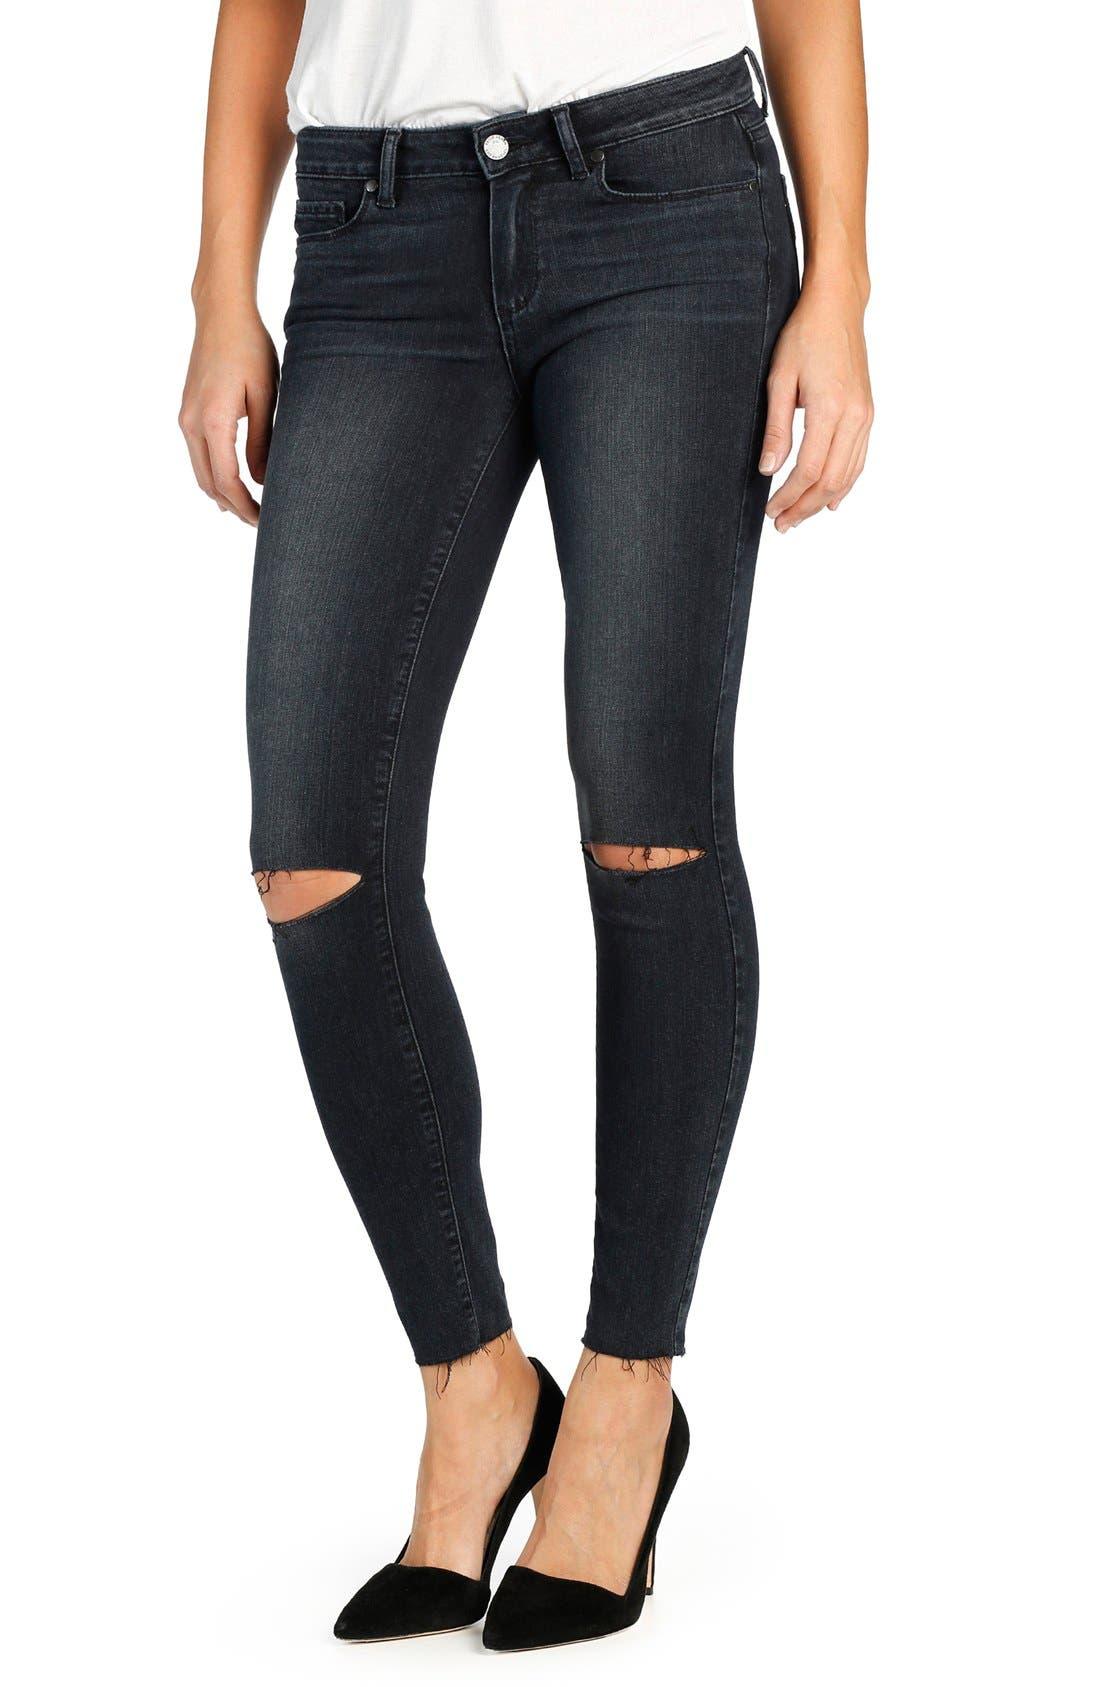 Alternate Image 1 Selected - PAIGE Transcend Verdugo Ripped Ankle Ultra Skinny Jeans (Kaleea Destructed)